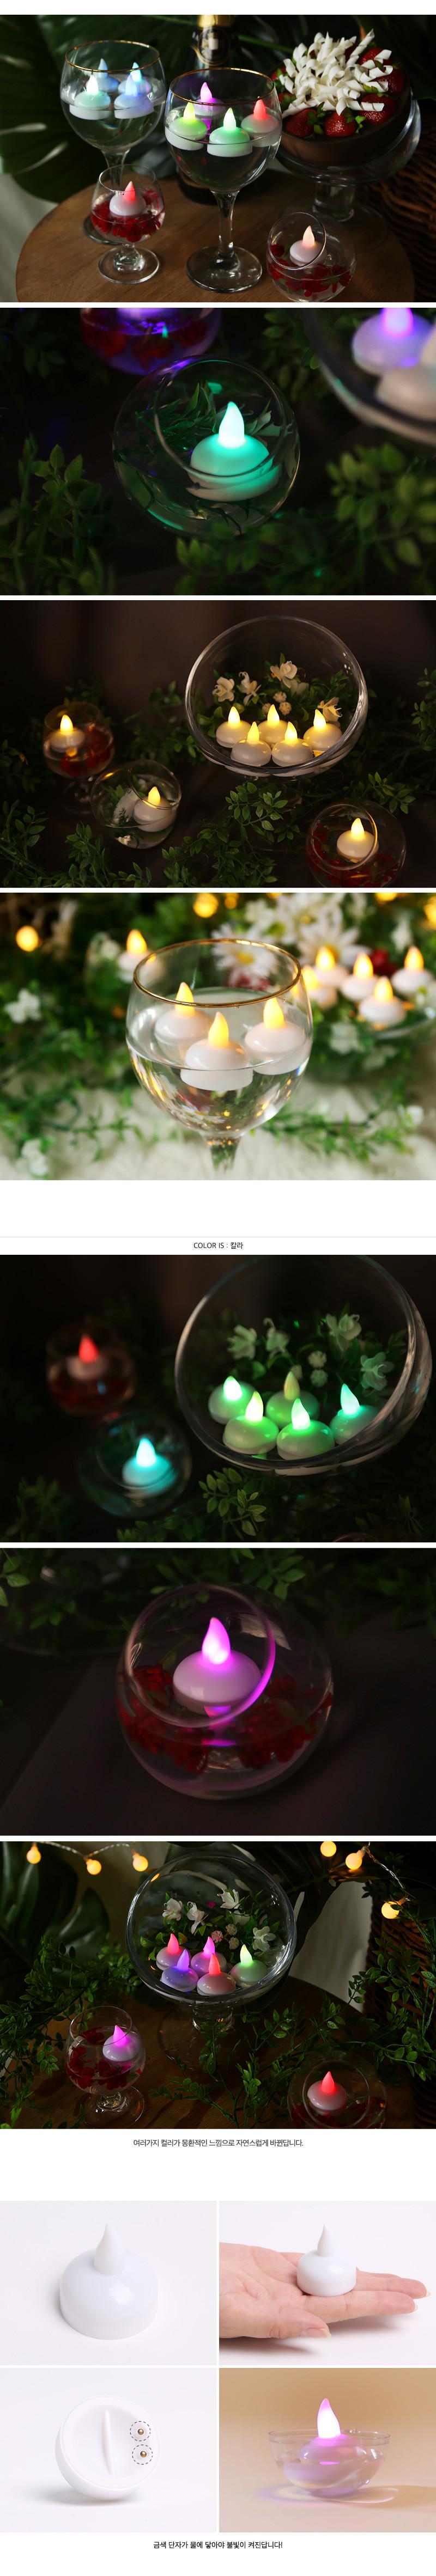 LED 티라이트 1개입 (물에뜨는 촛불) - 웜노랑 - 파티해, 1,500원, 파티용품, 양초/폭죽